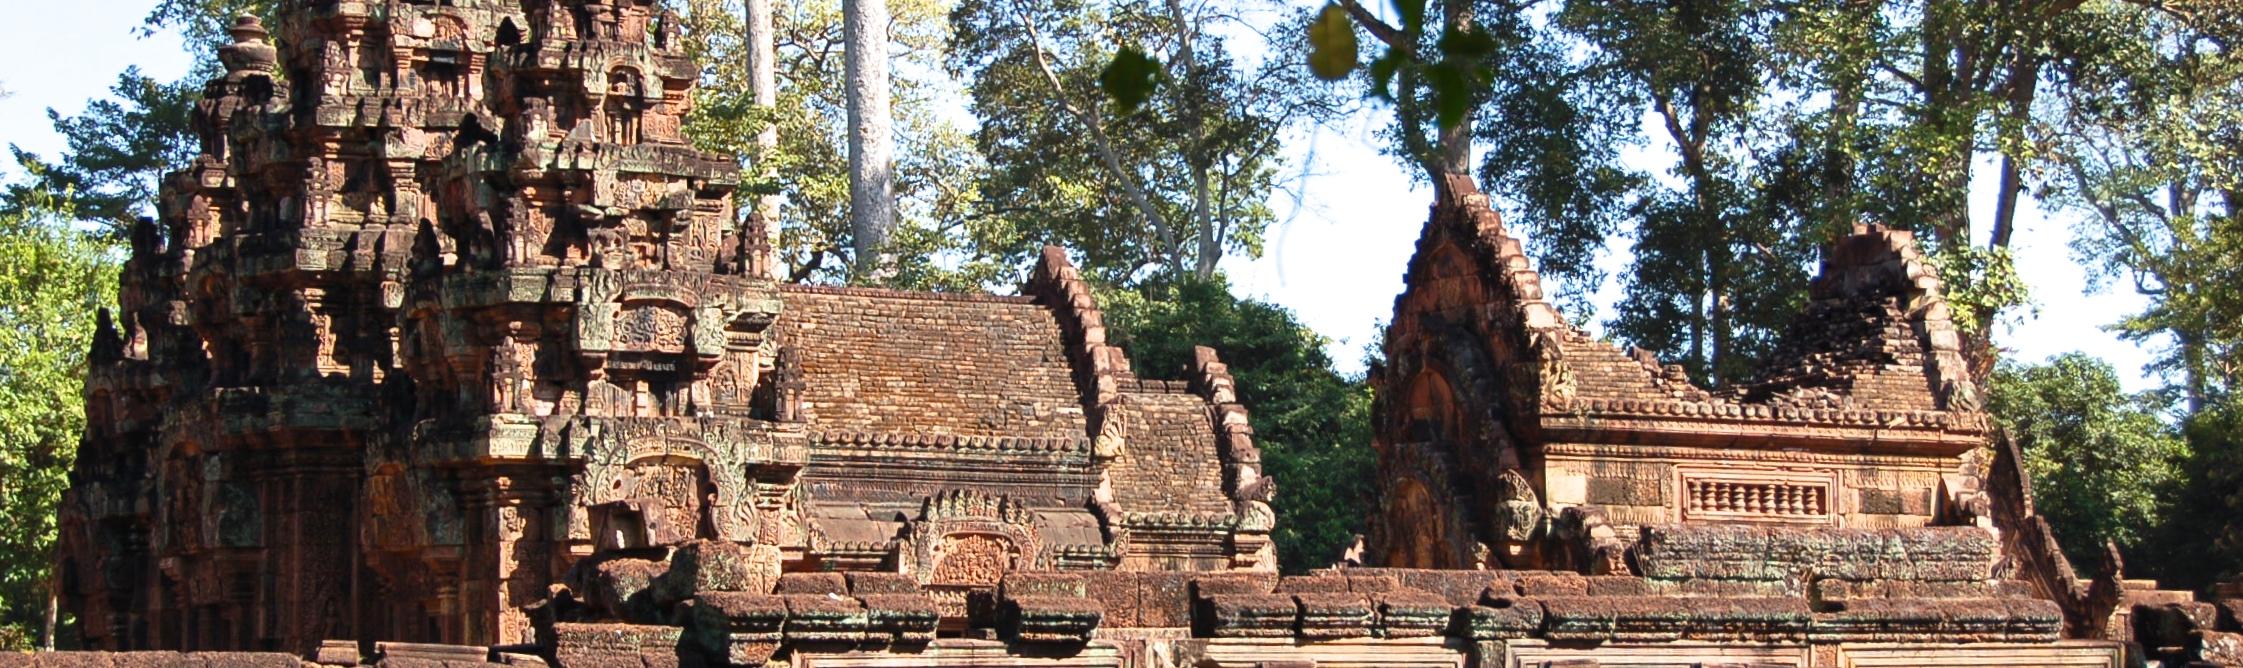 Camboya_Angkor Wat Grand Tour Banteay Srey